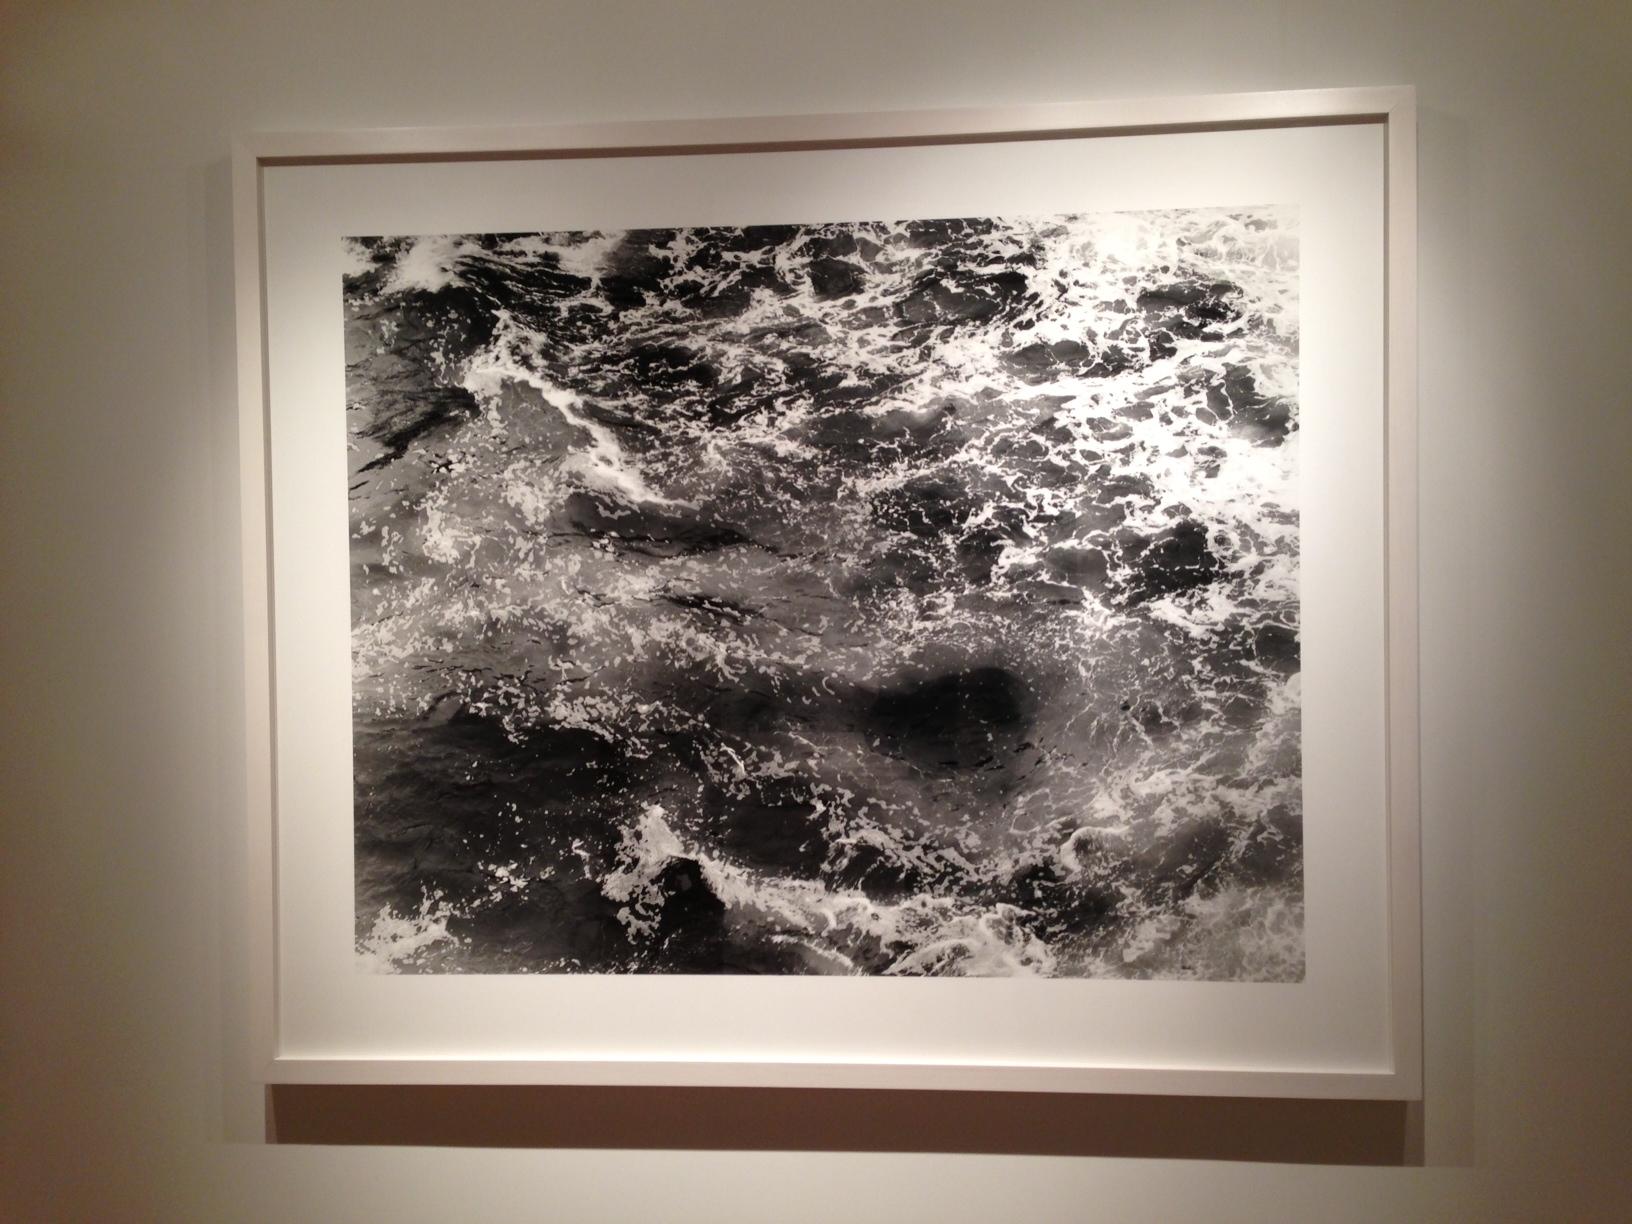 Chip Hooper Surf #2000, 2012; Image Laura Messersmith